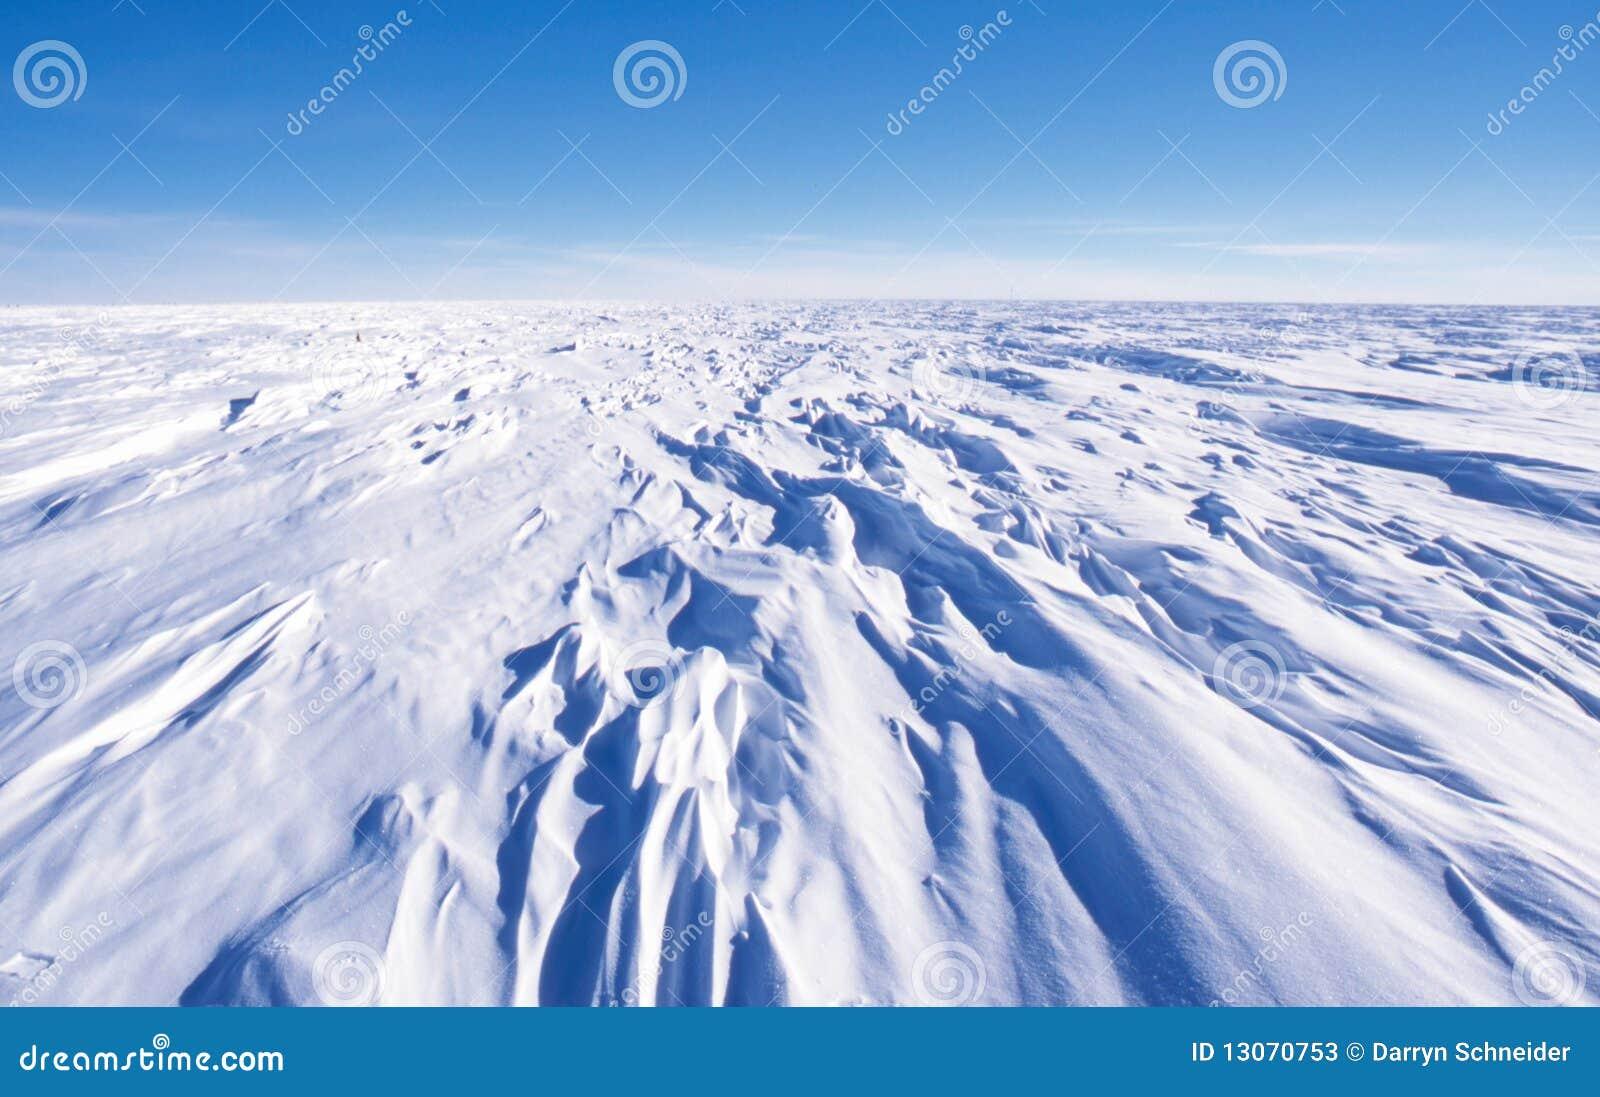 Sastrugi on the Antarctic Polar Plateau